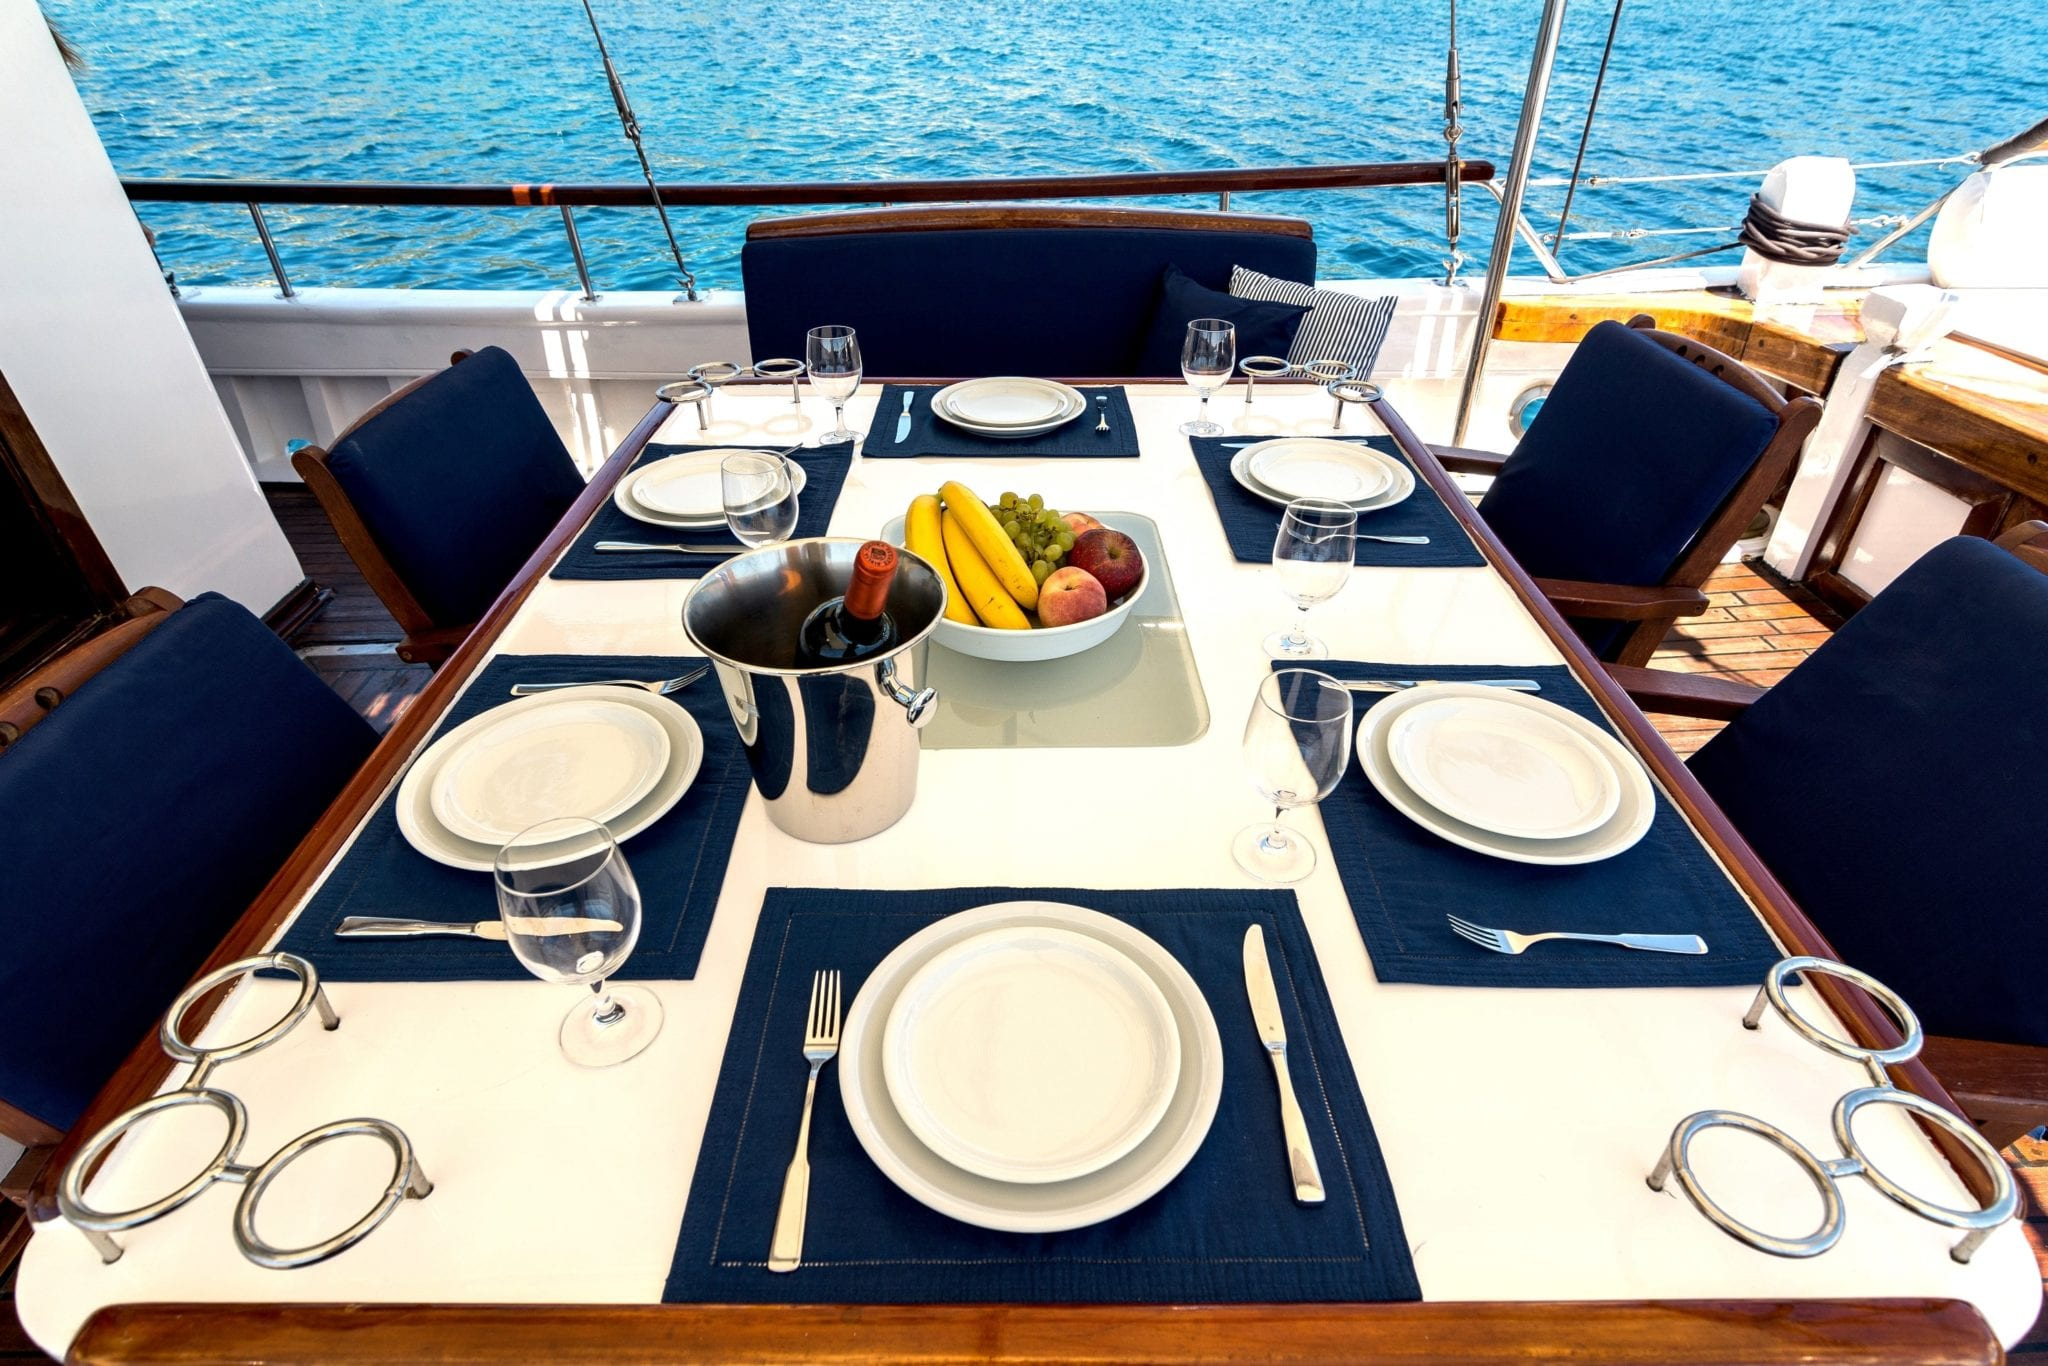 joanna k greek motor sailer aft table (2) min -  Valef Yachts Chartering - 4400